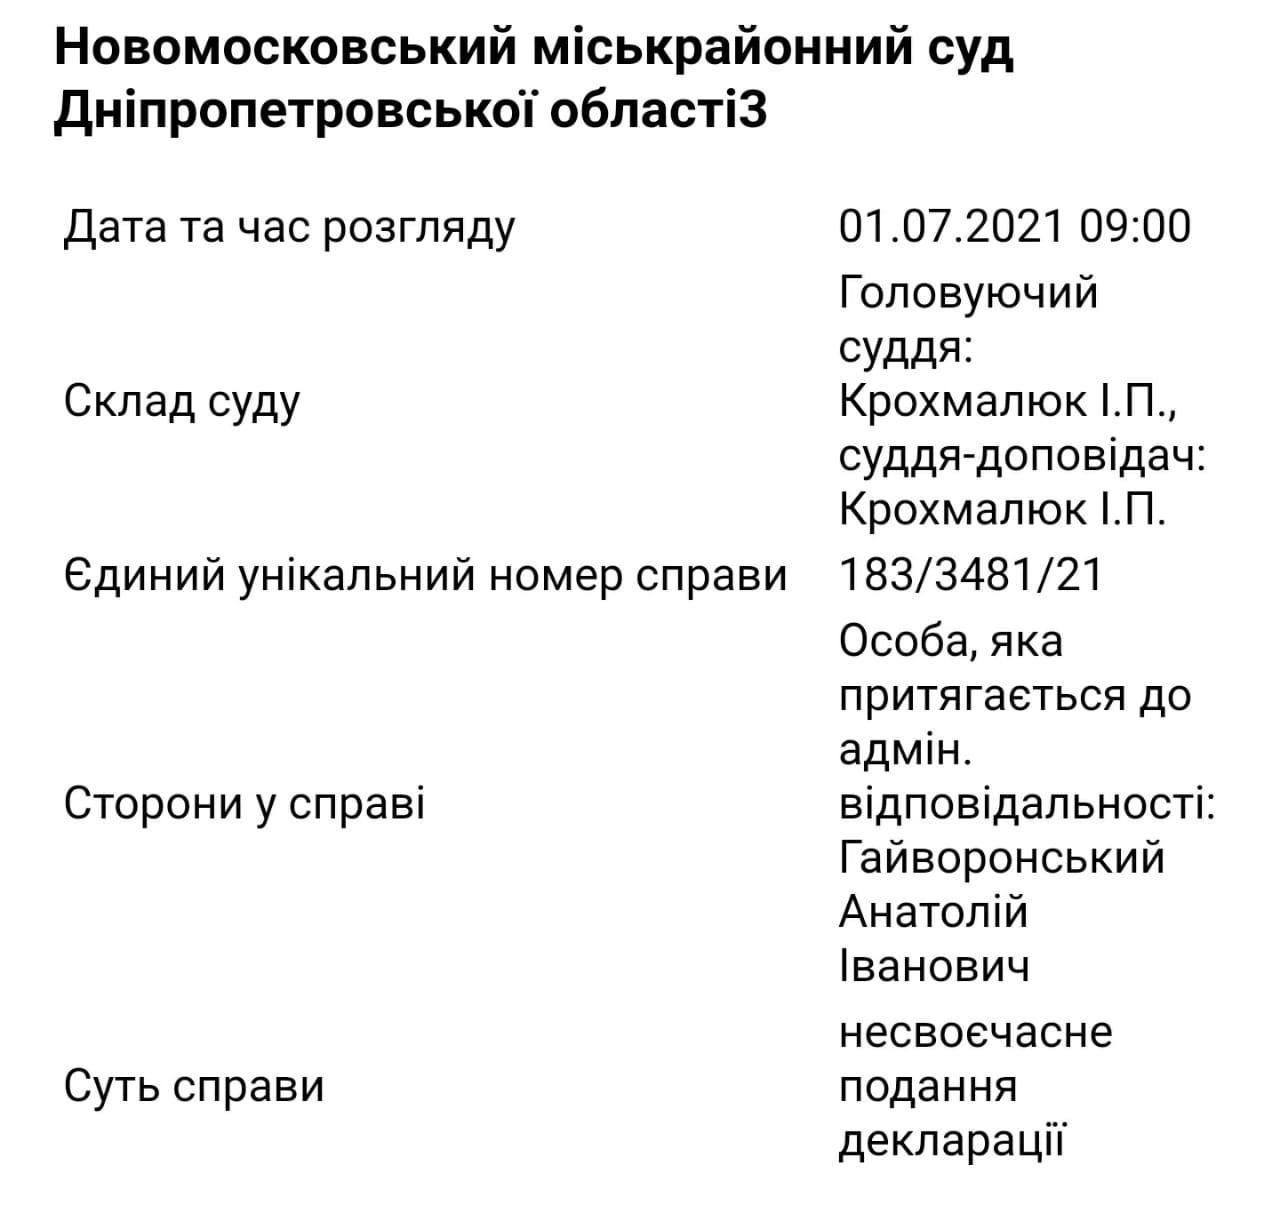 C:\Users\Admin\Desktop\МВ\Гайворонский\IMG-20210630-WA0000 (1).jpg